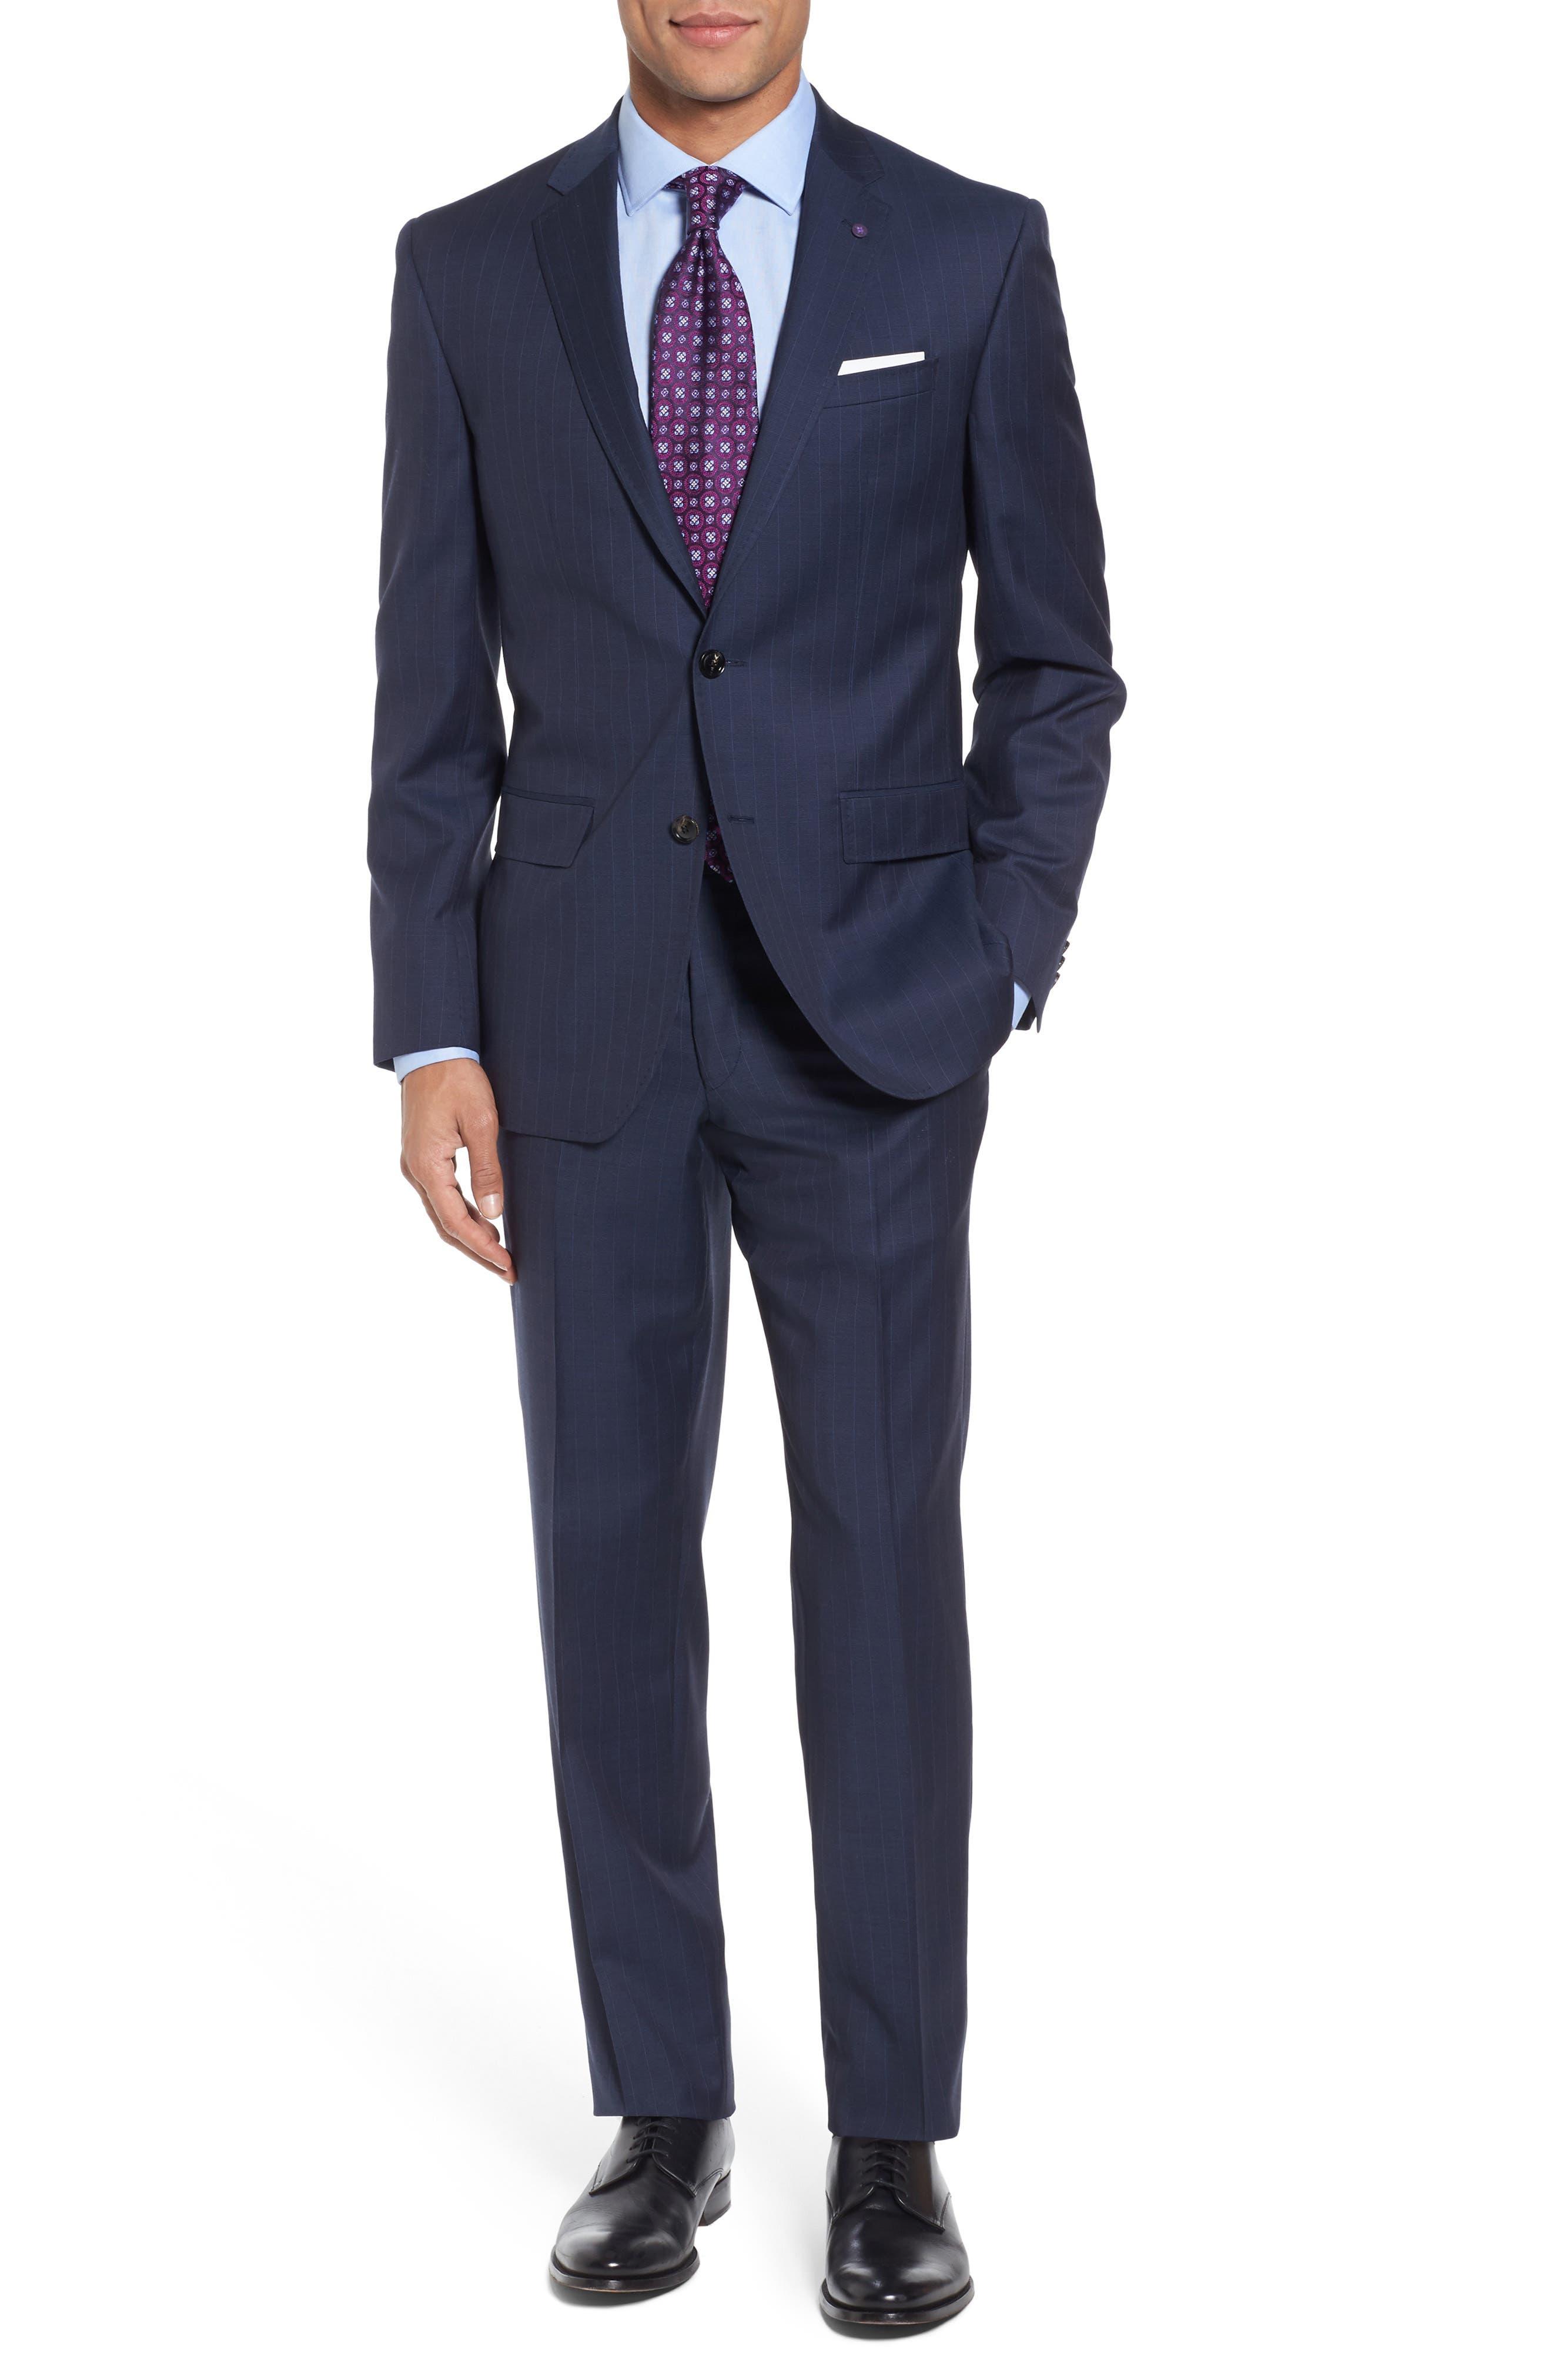 Main Image - Ted Baker London Jay Trim Fit Stripe Wool Suit